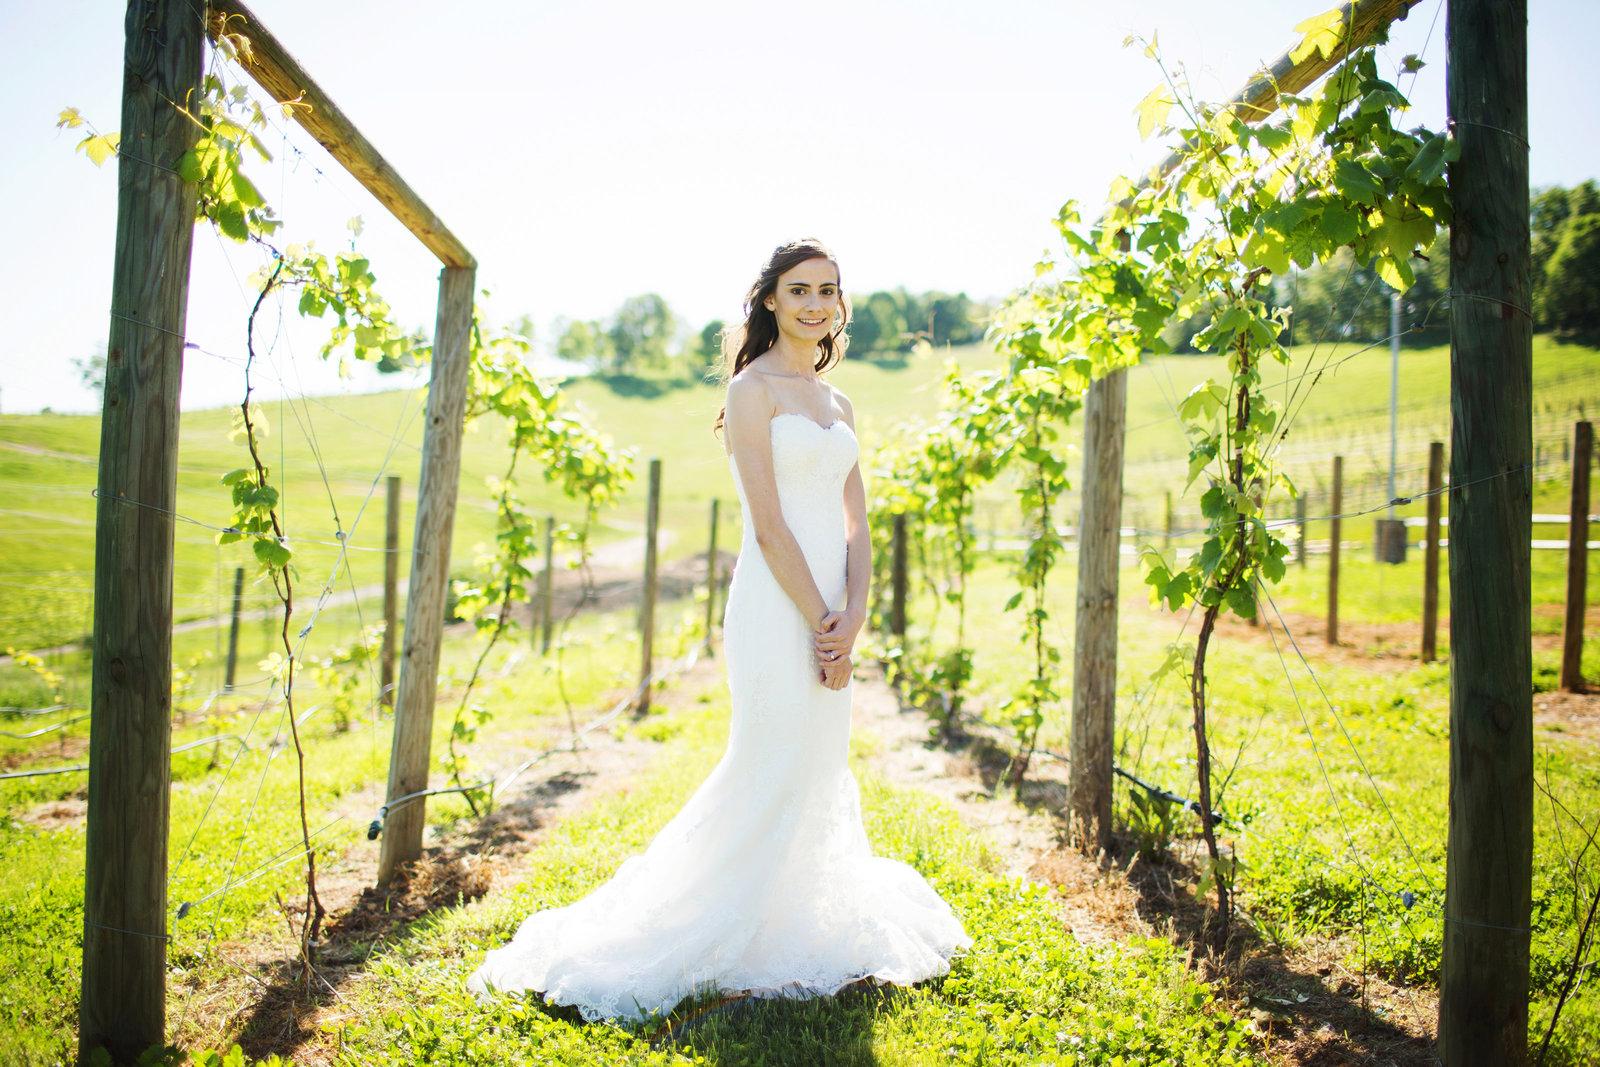 bridal portrait skyryder engagement wedding photography blacksburg roanoke charlottesville lexington radford-009